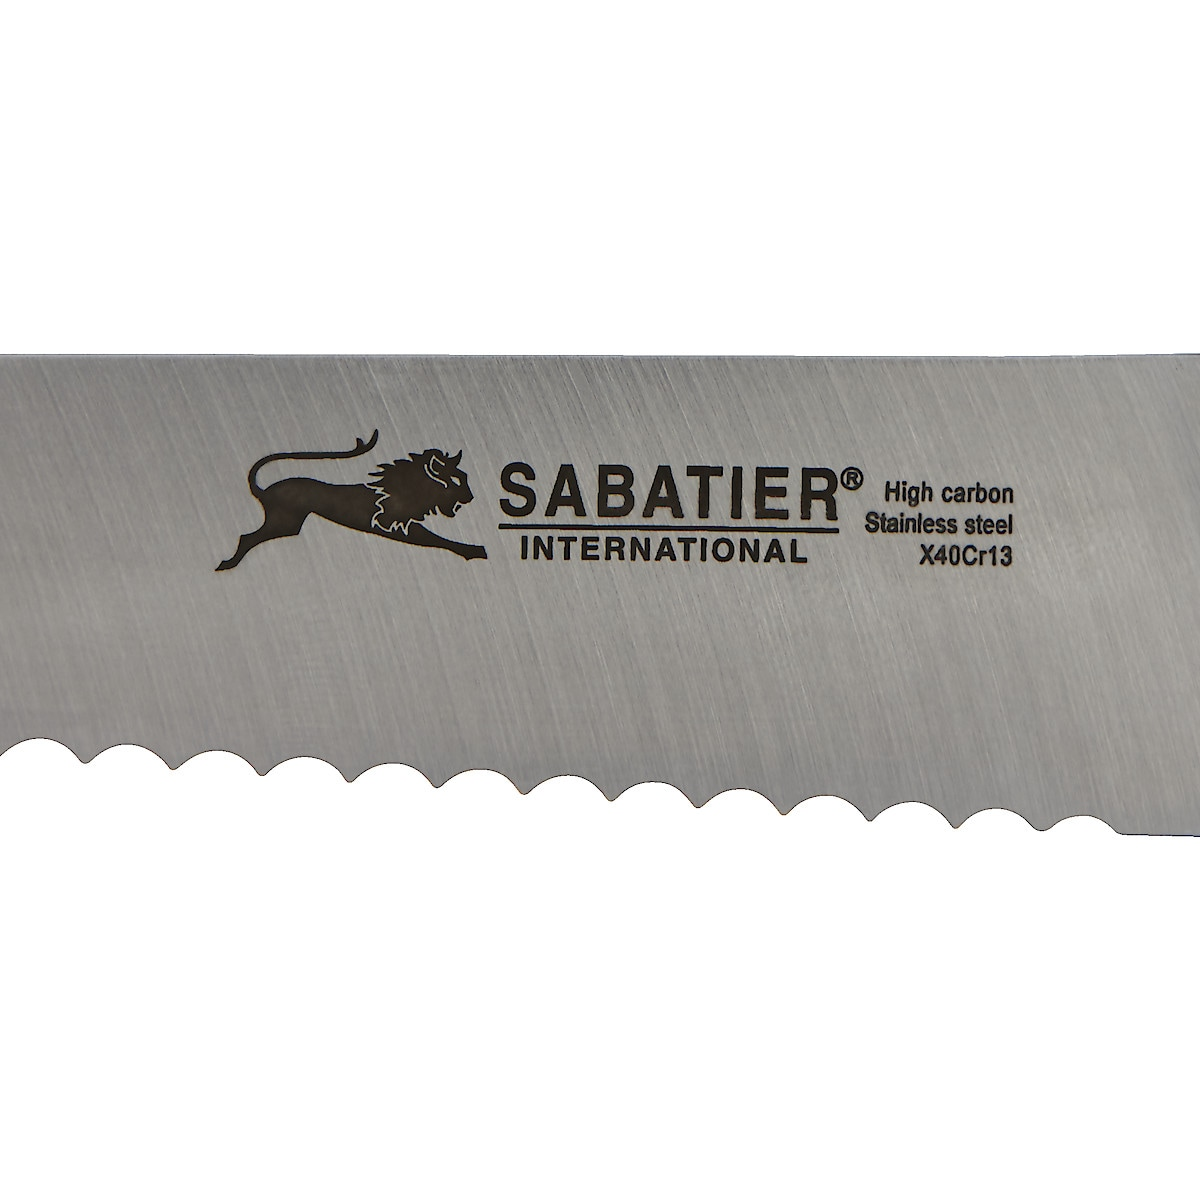 Sabatier 20 cm brødkniv